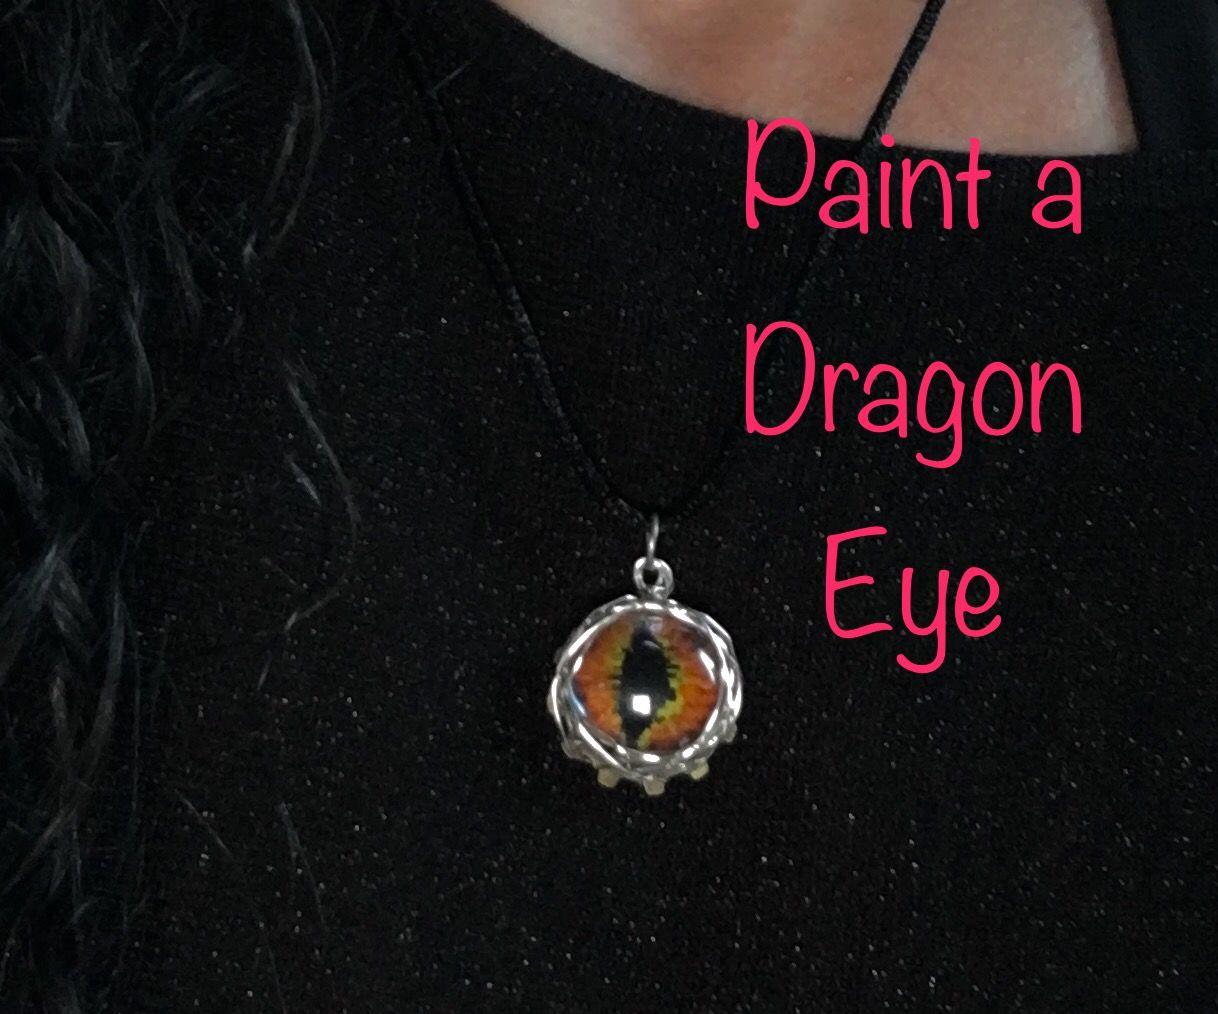 How to Make a Dragon Eye